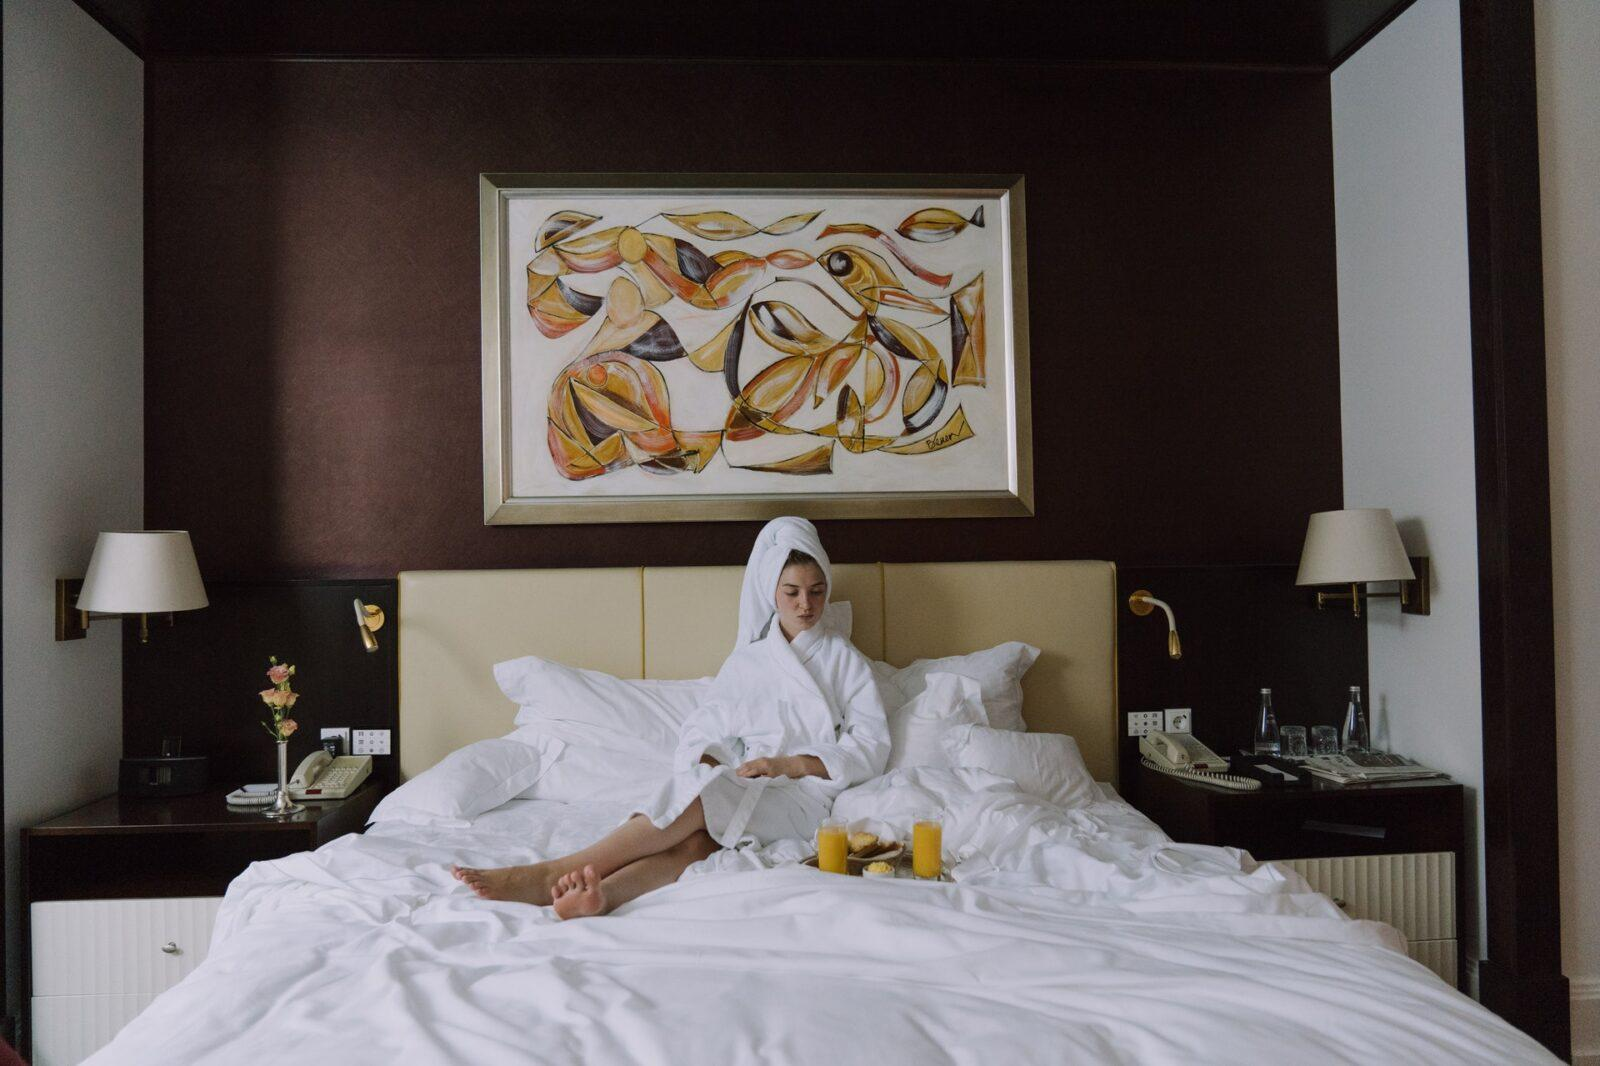 inteligentny hotel